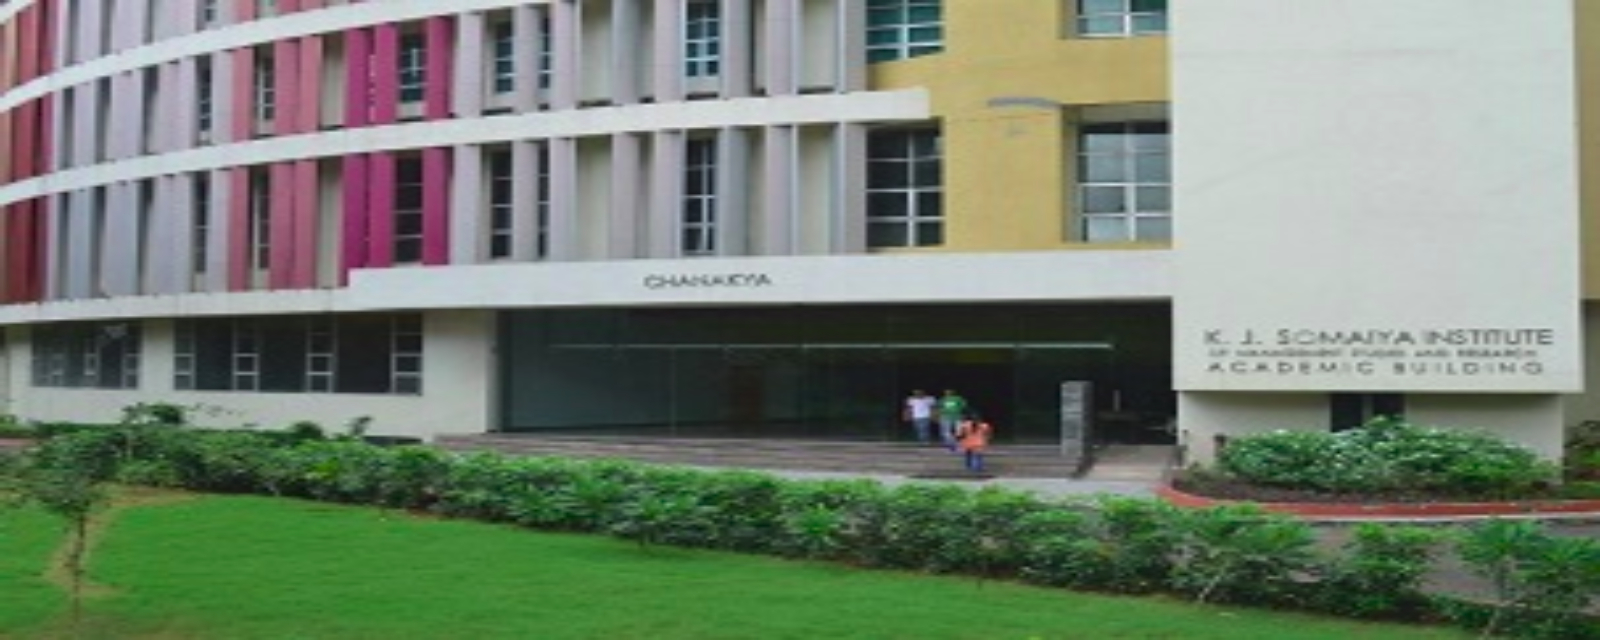 KJ Somaiya Institute of Management Studies and Research